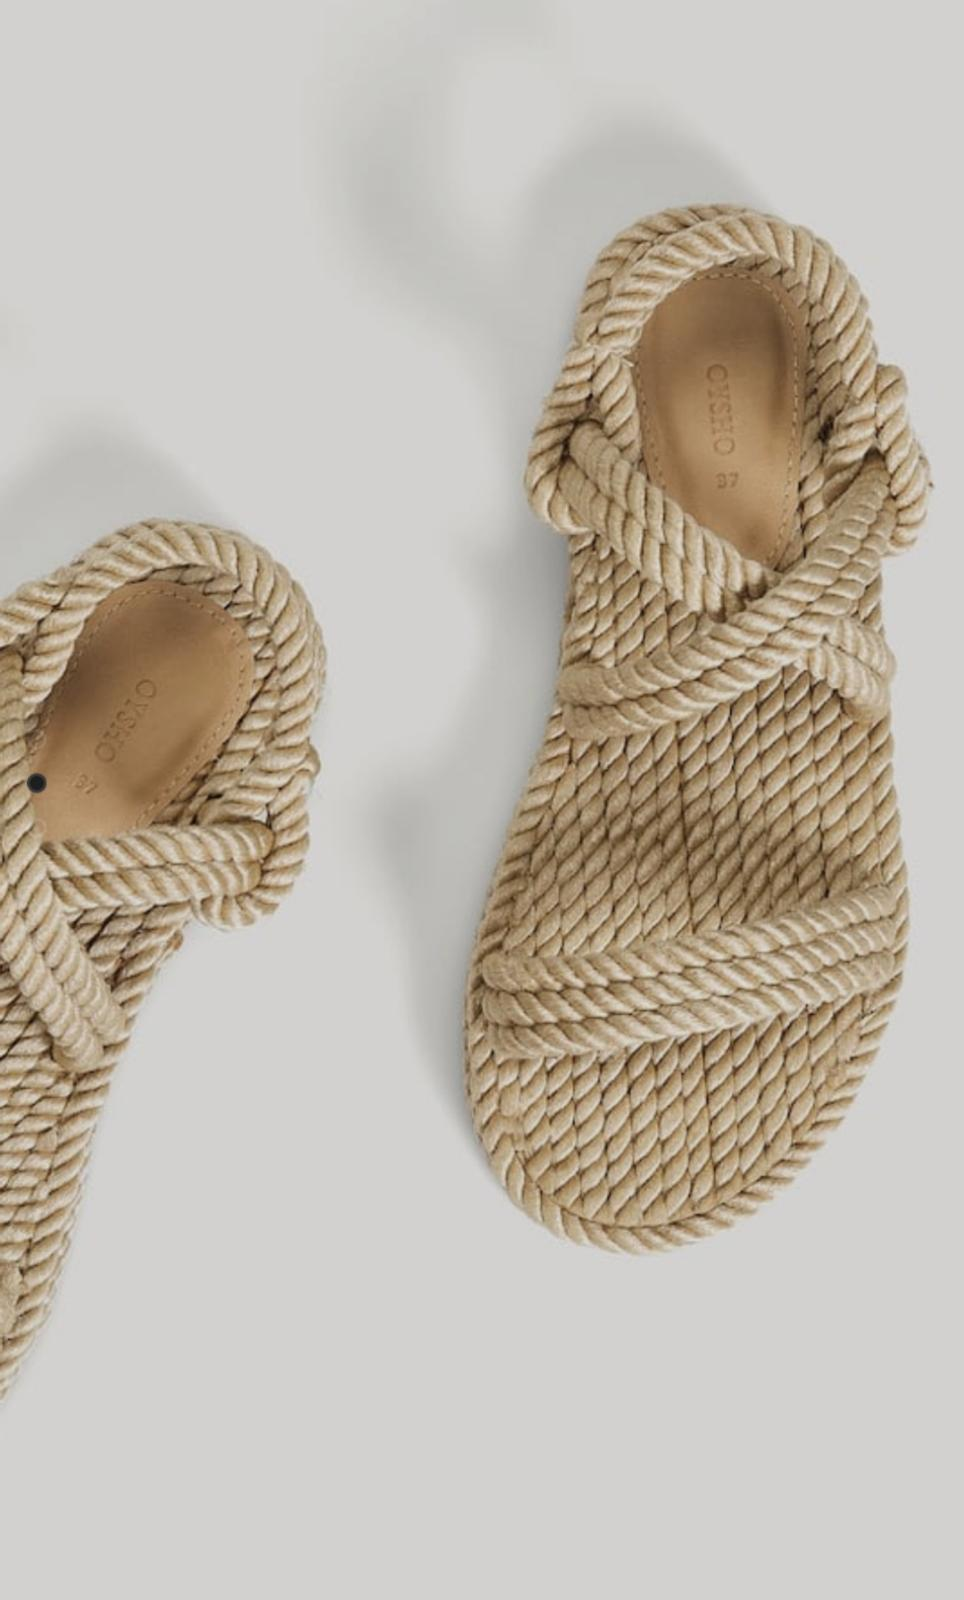 sandalias con cuerdas